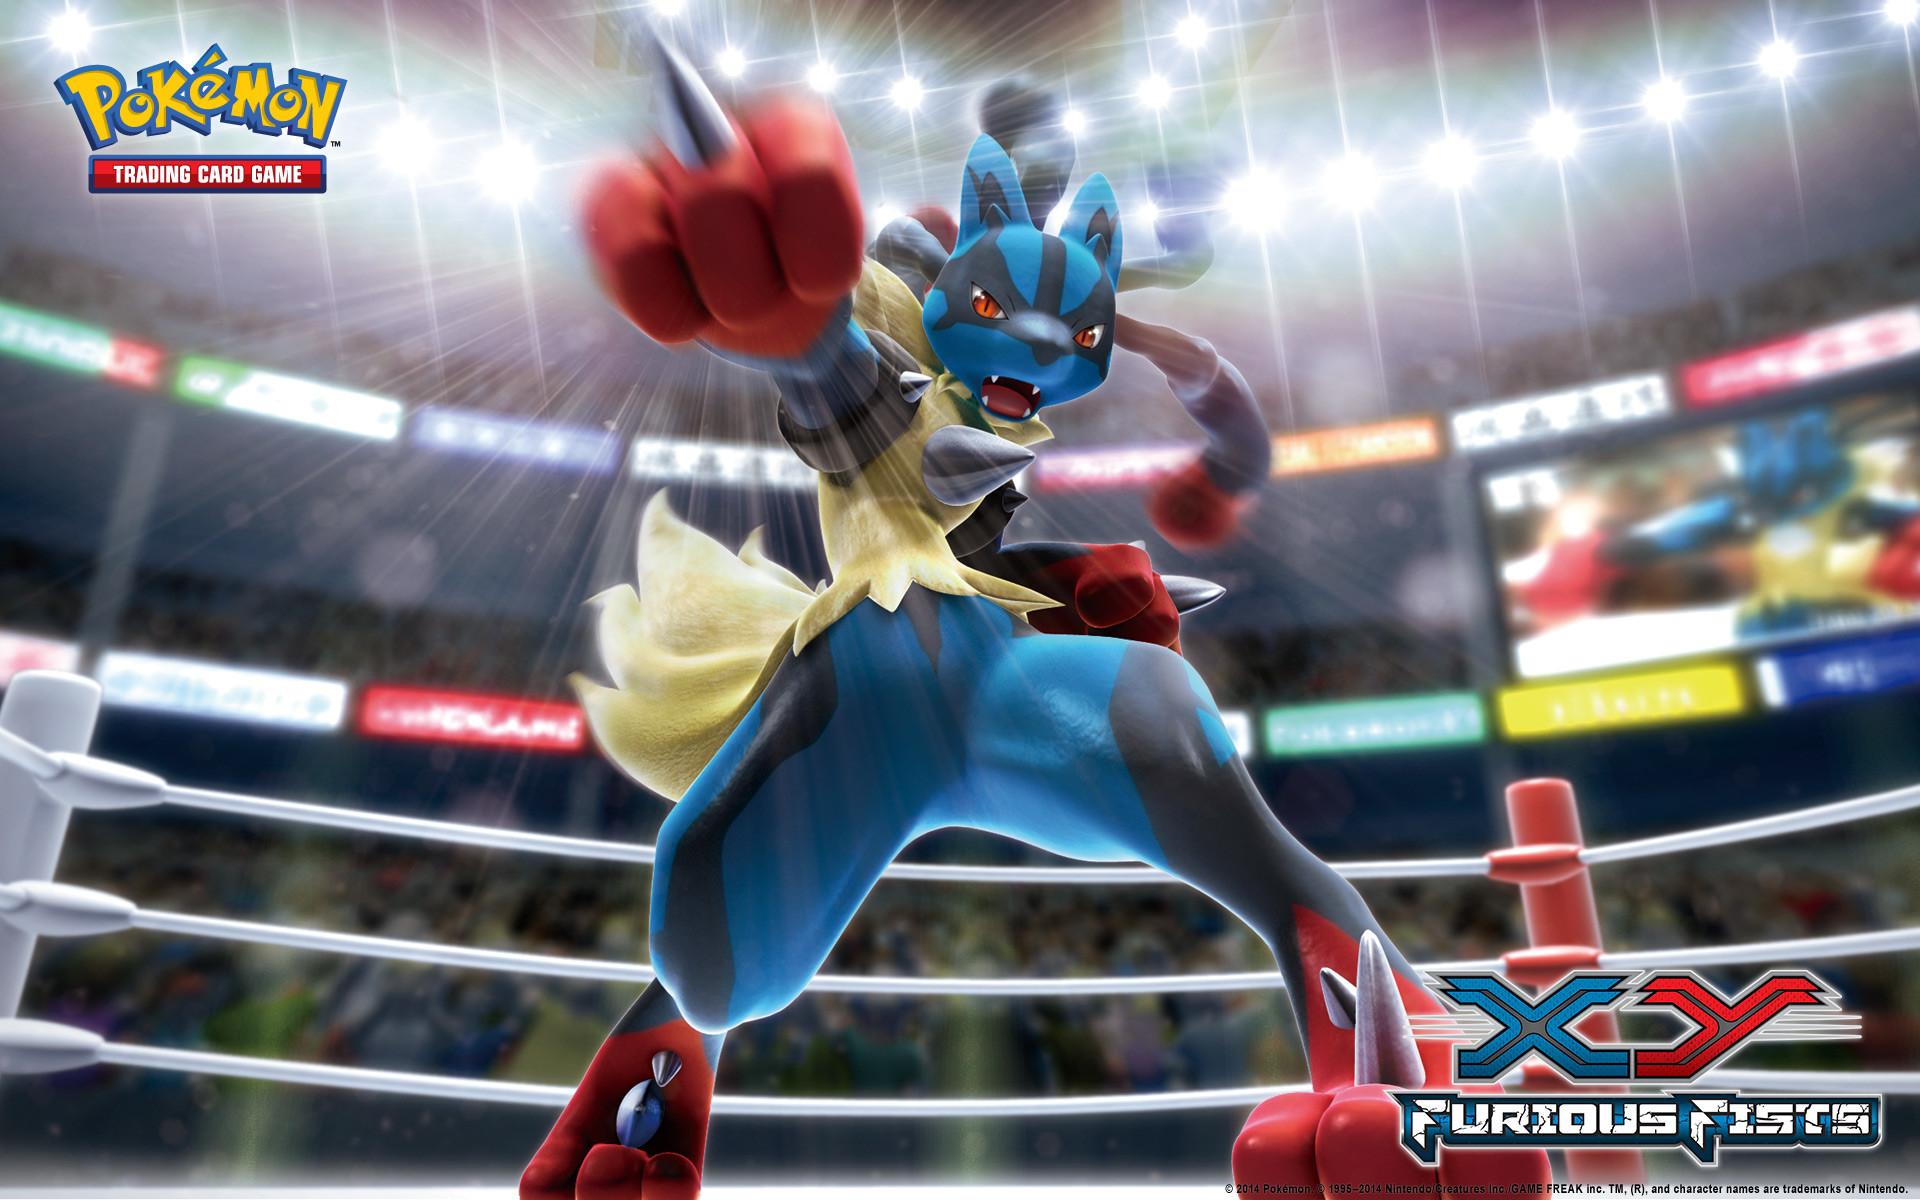 Pokémon TCG: XY—Furious Fists Mega Lucario Wallpaper